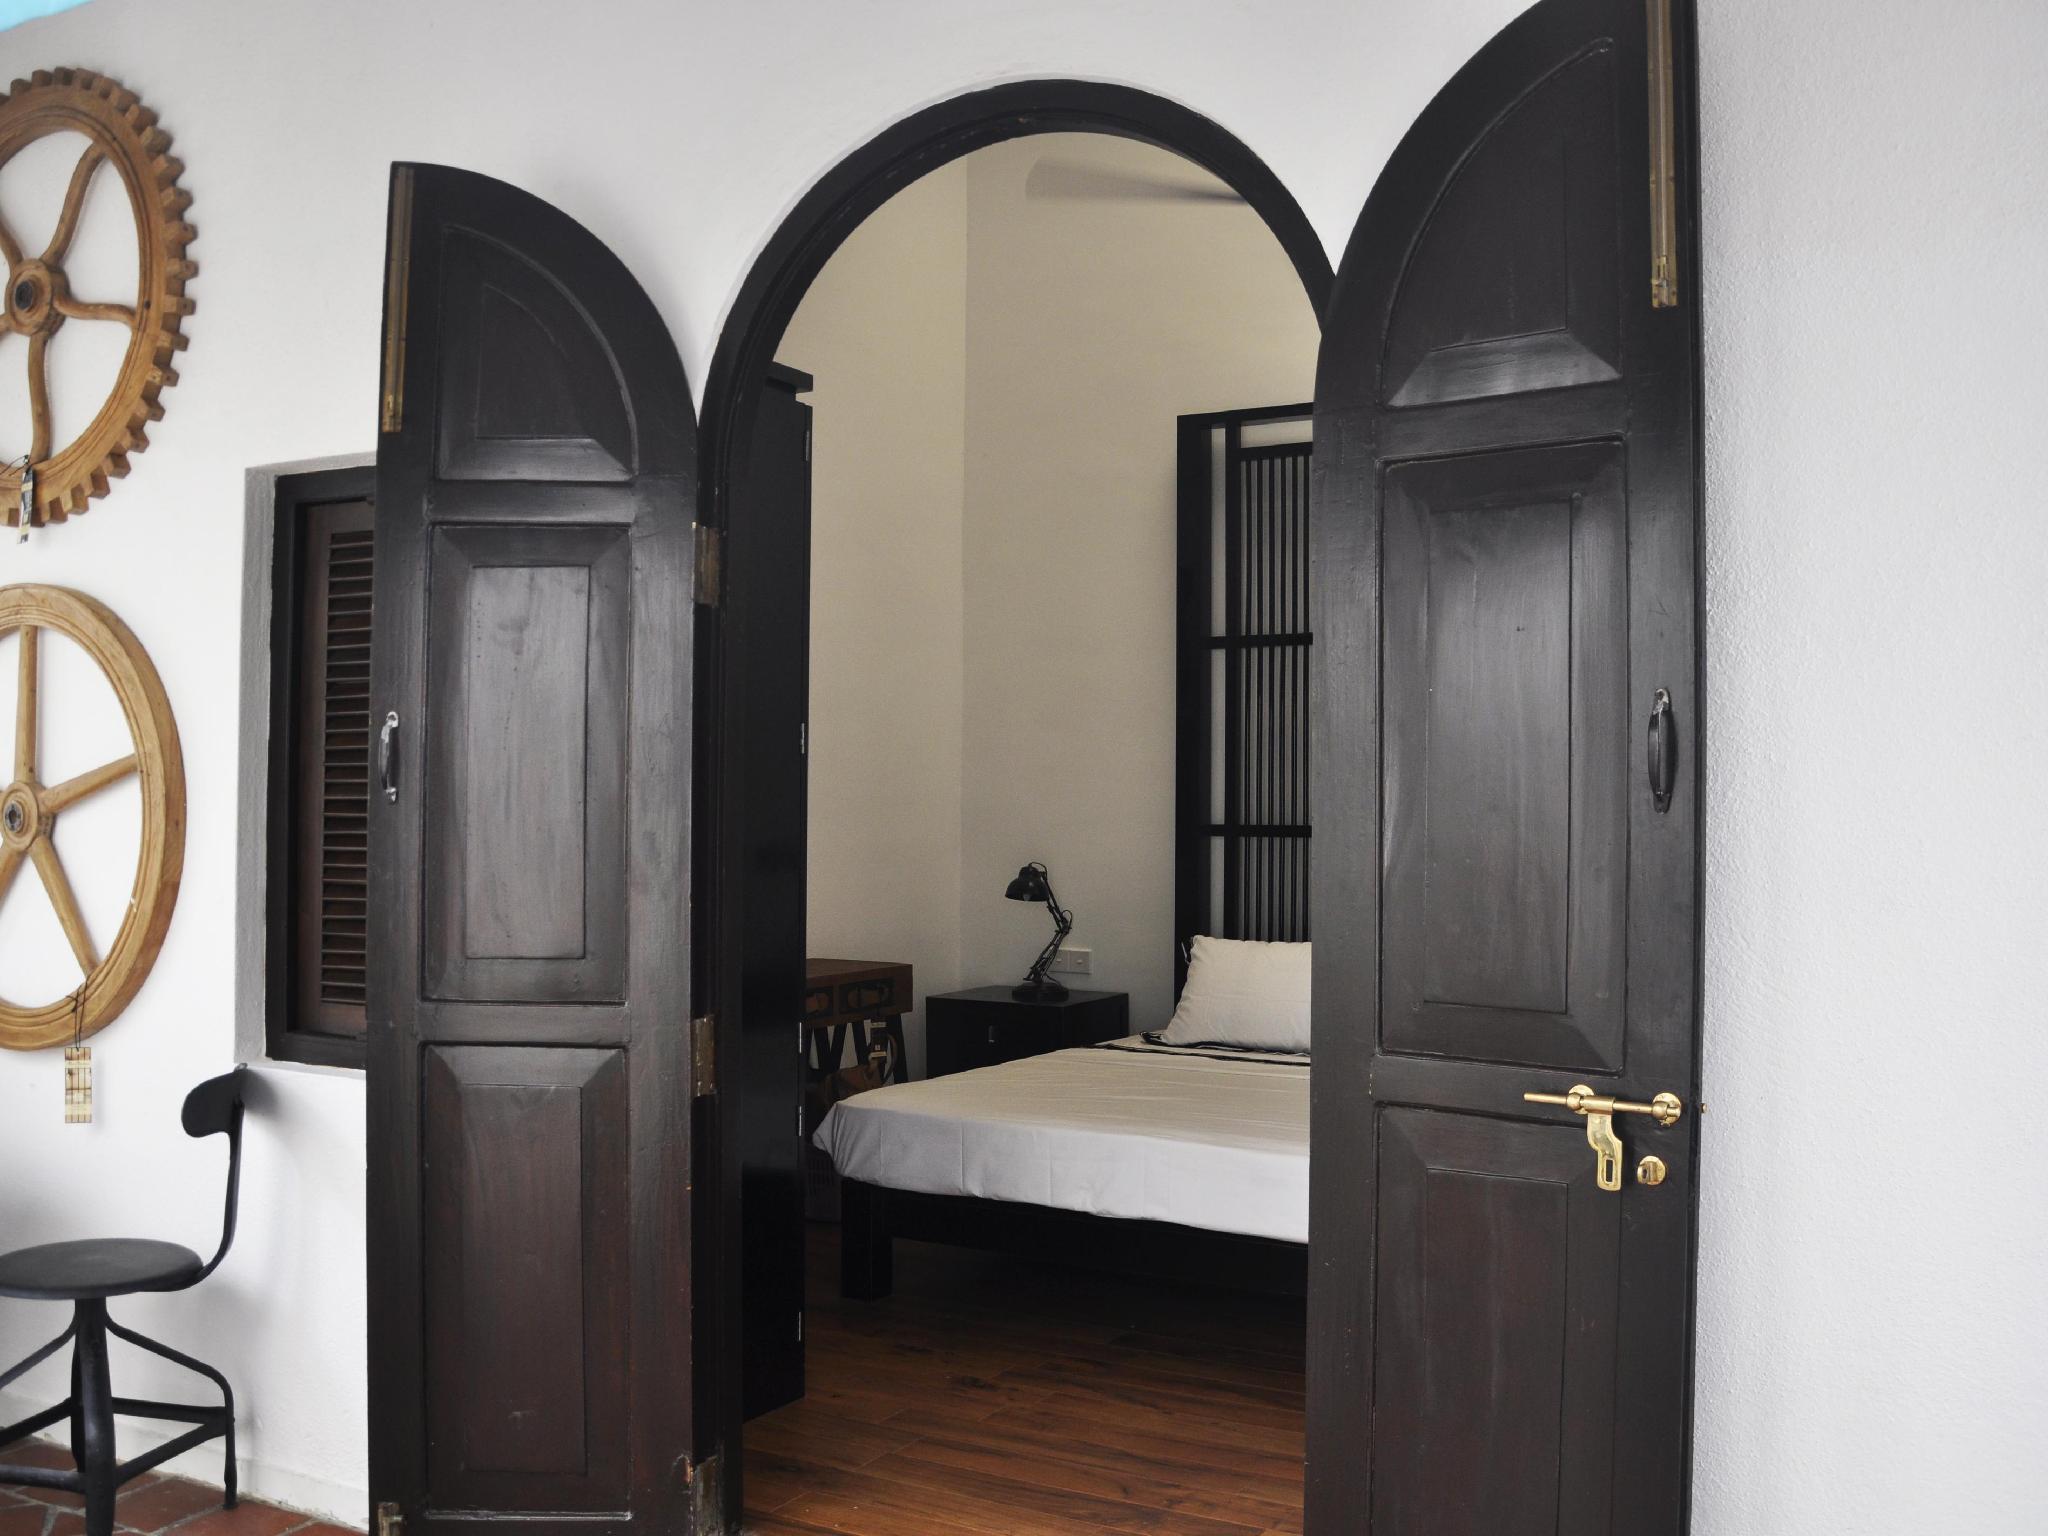 lectricit finest v lo maison creation d lectricit r. Black Bedroom Furniture Sets. Home Design Ideas